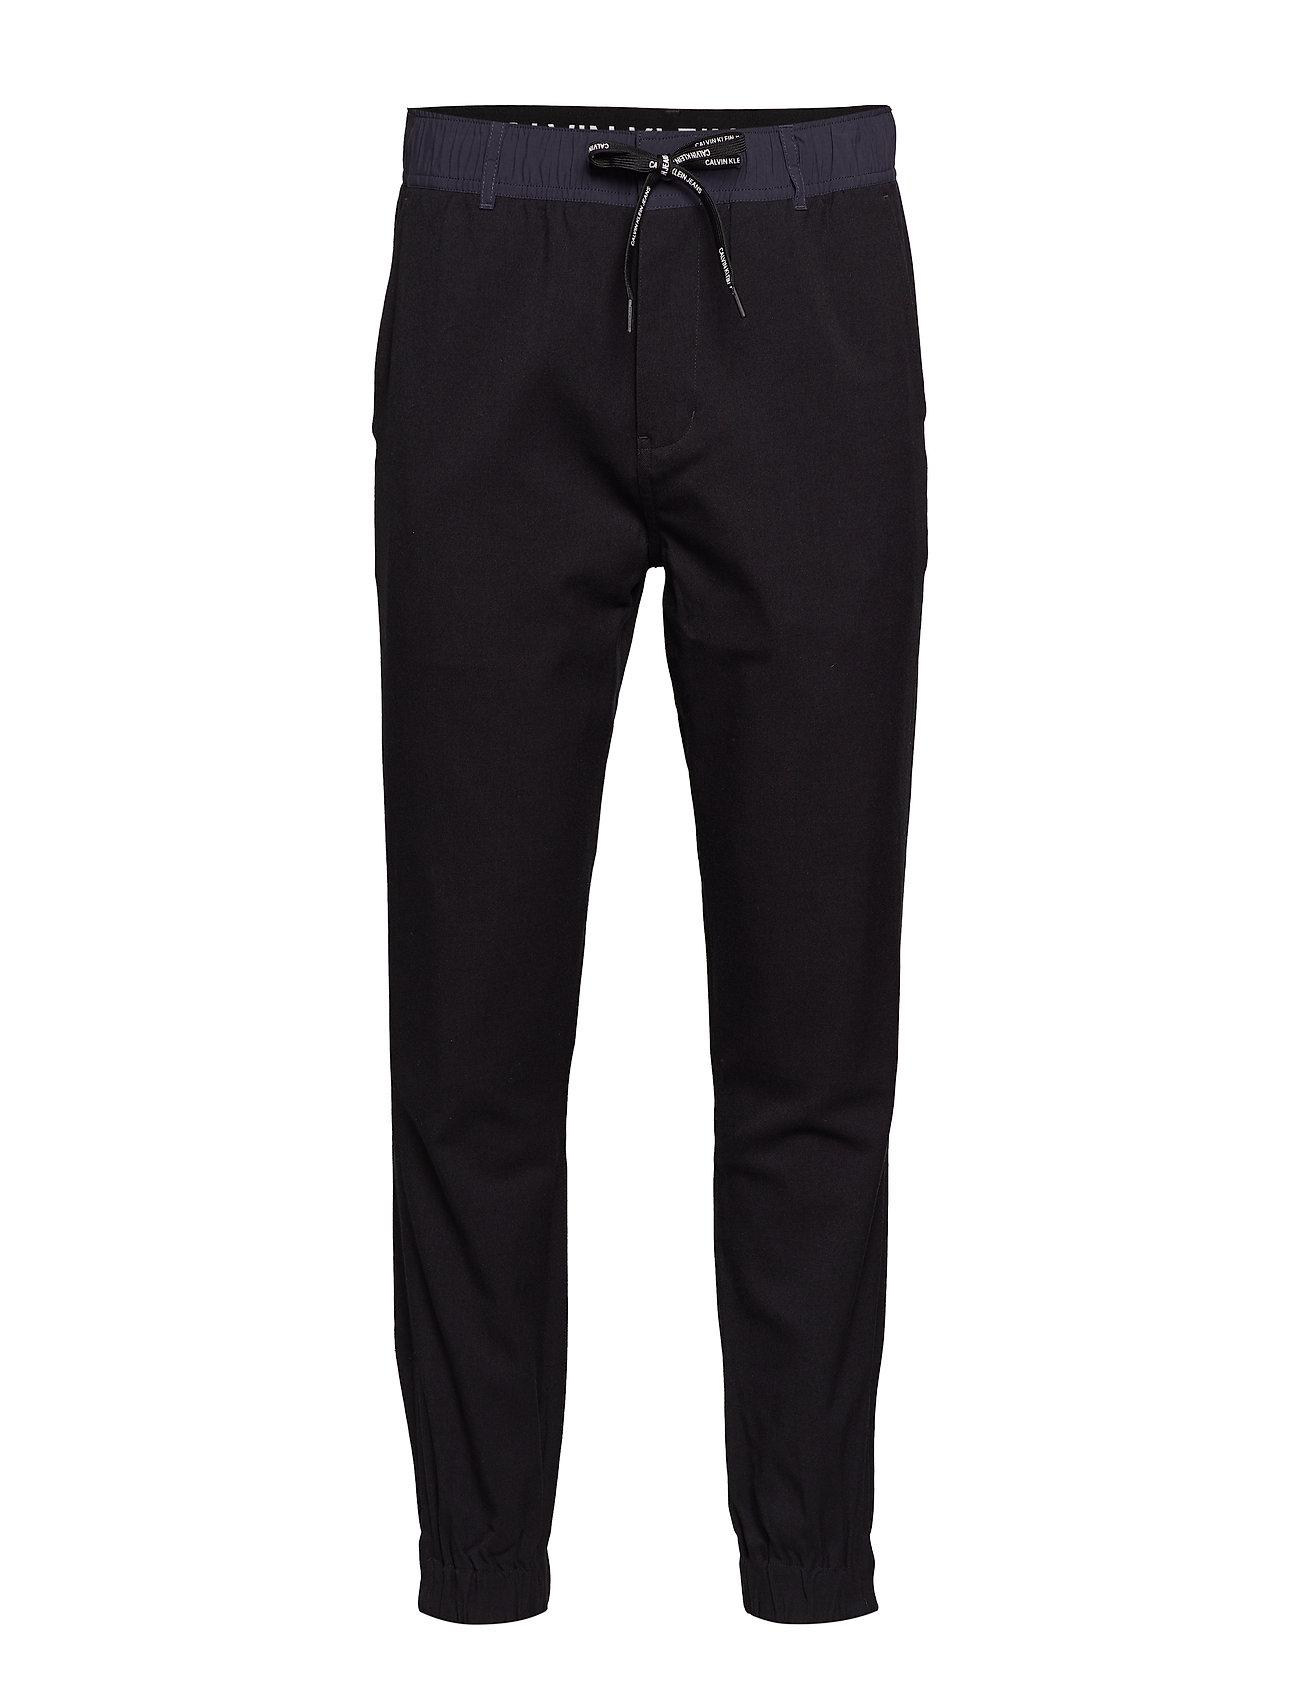 Calvin Klein Jeans MIX MEDIA WOOL NYLON - CK BLACK